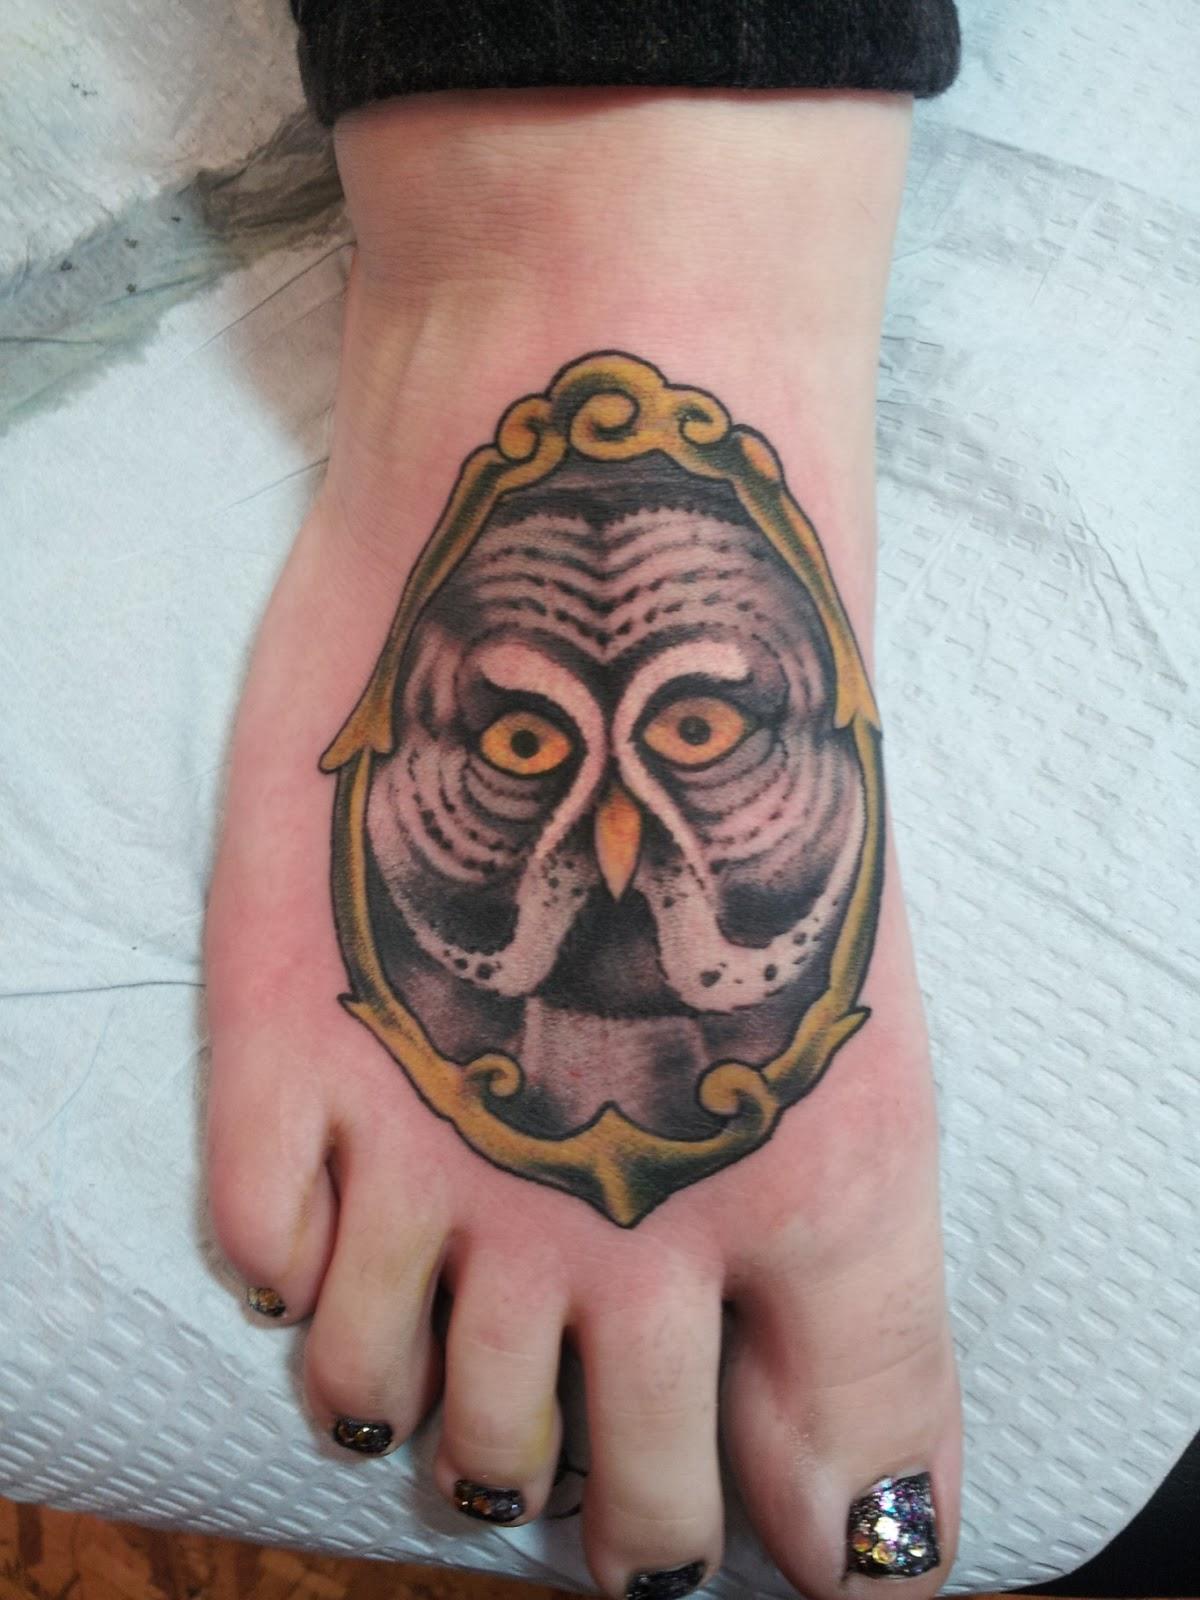 12 volt tattoo chico ca today tattoo by juan